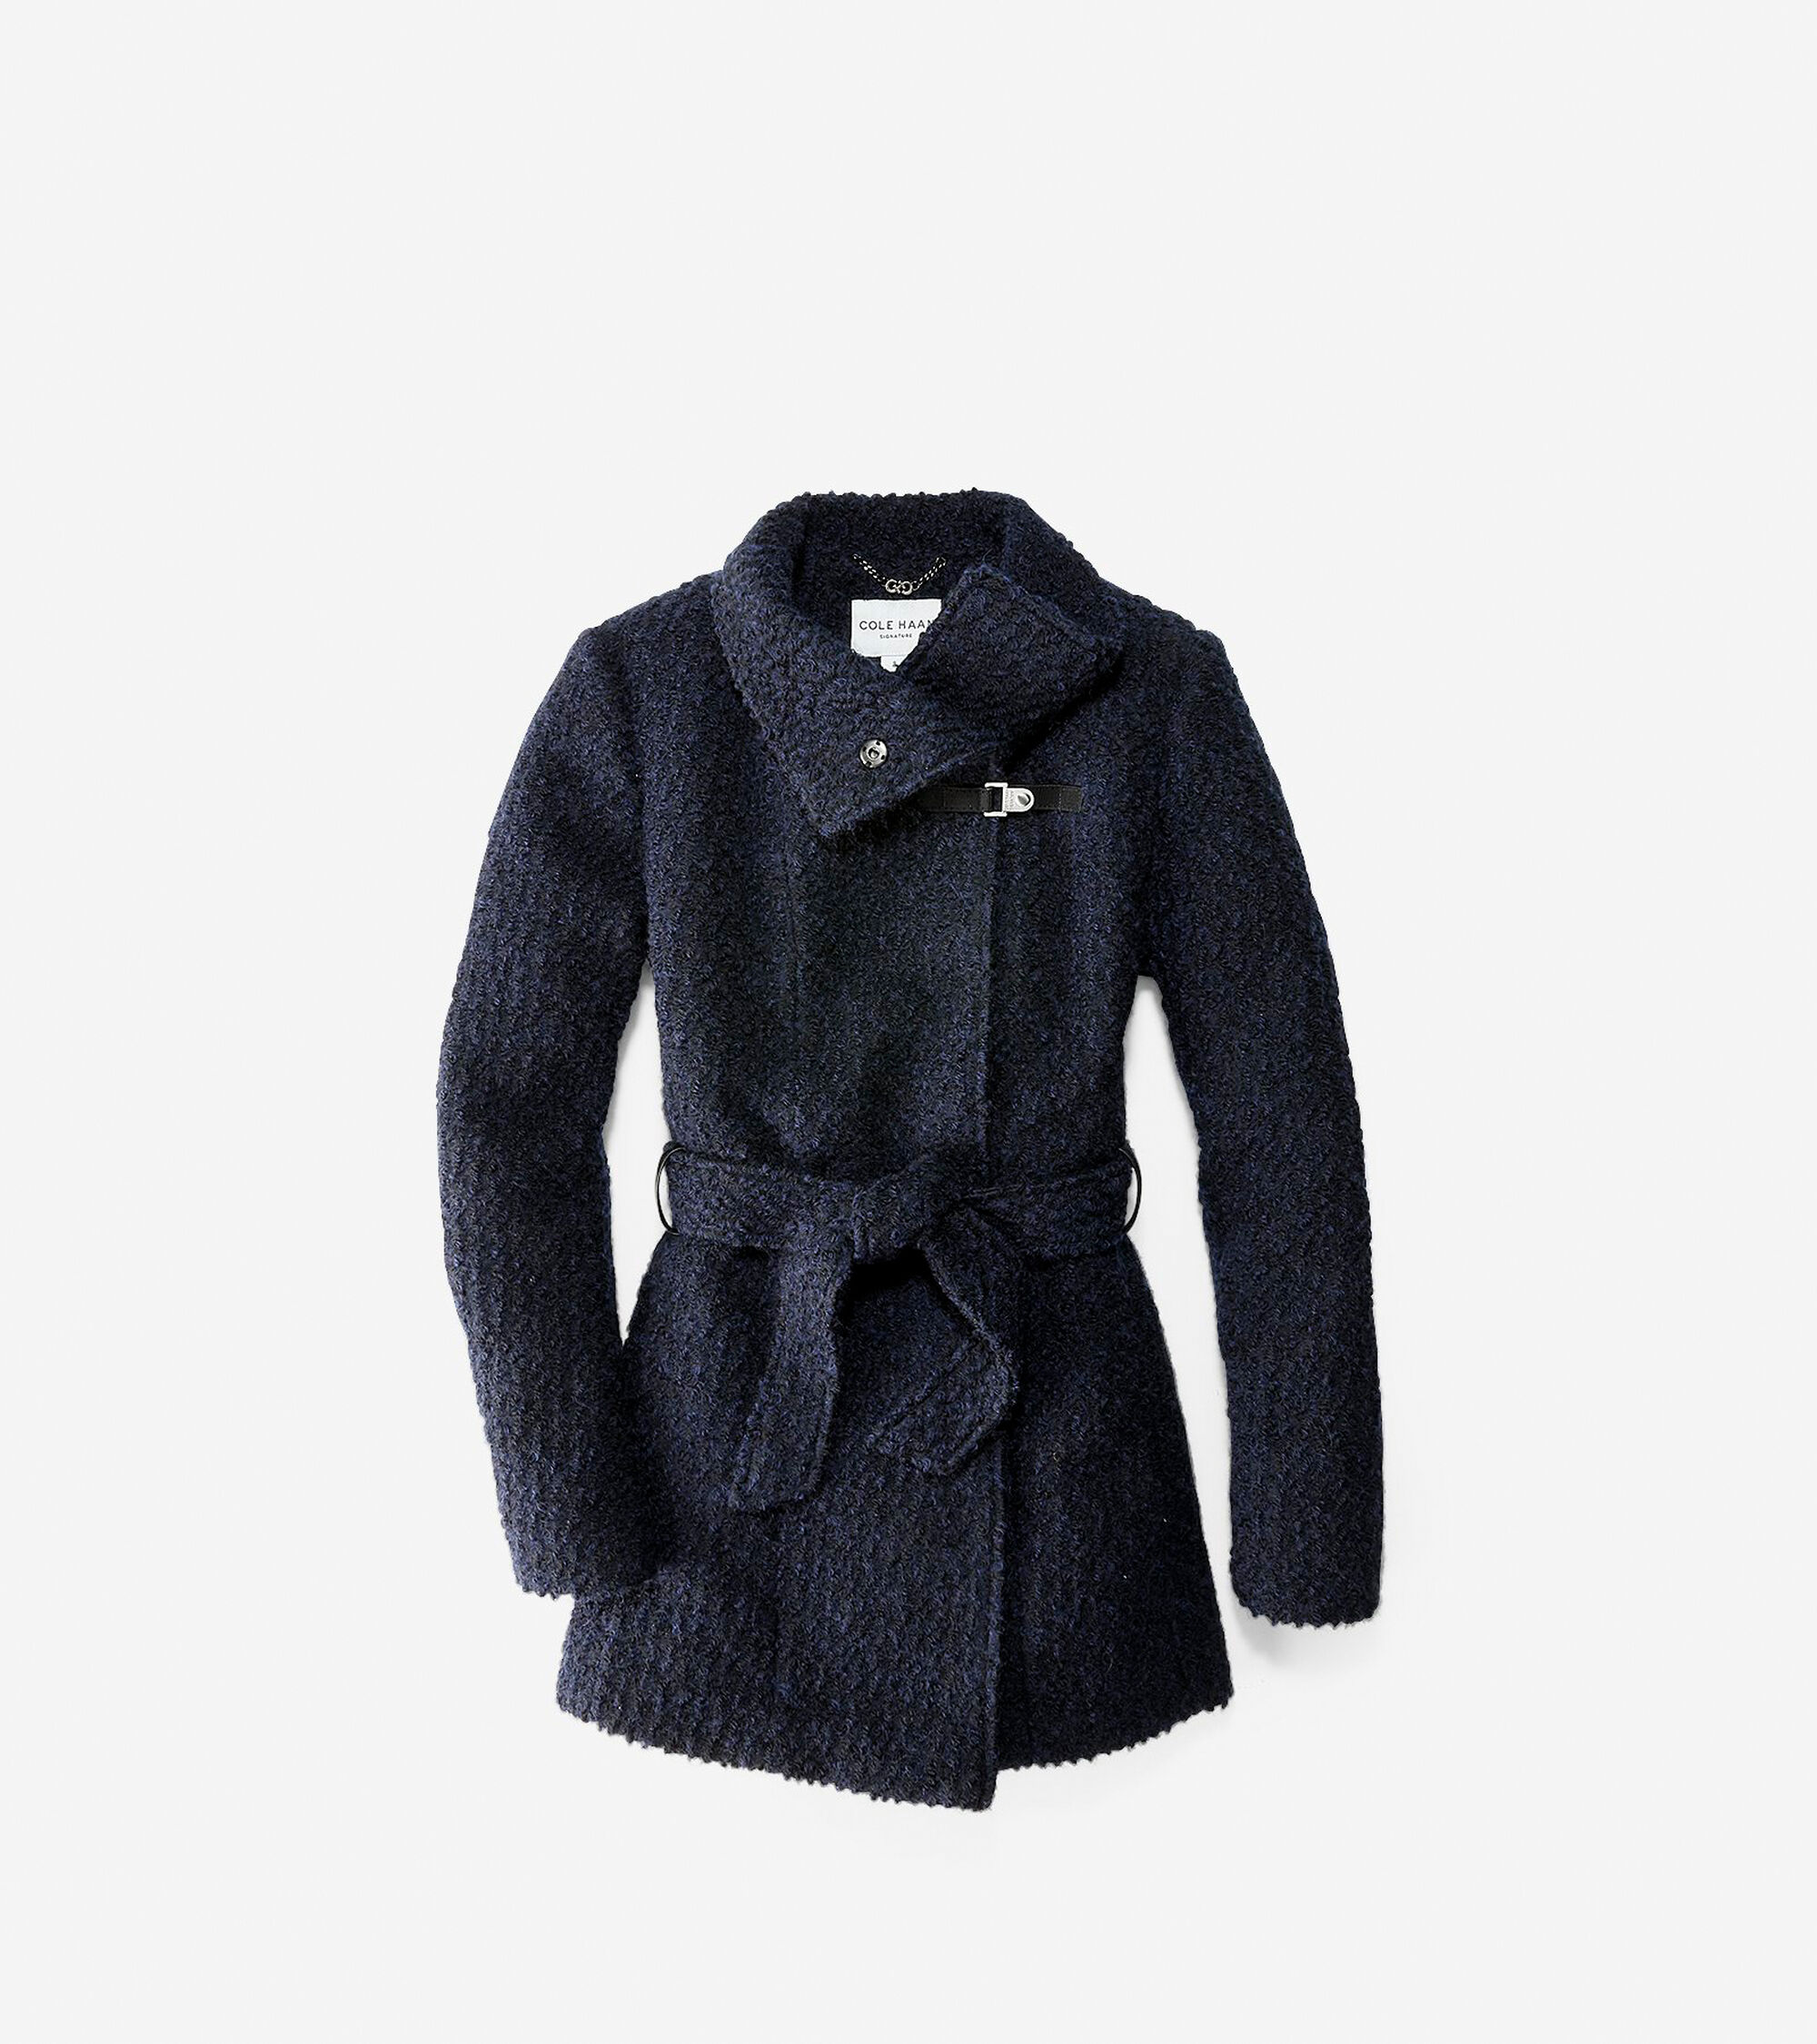 78e85257c109 Women s Funnel Collar Boucle Coat in Black-Navy